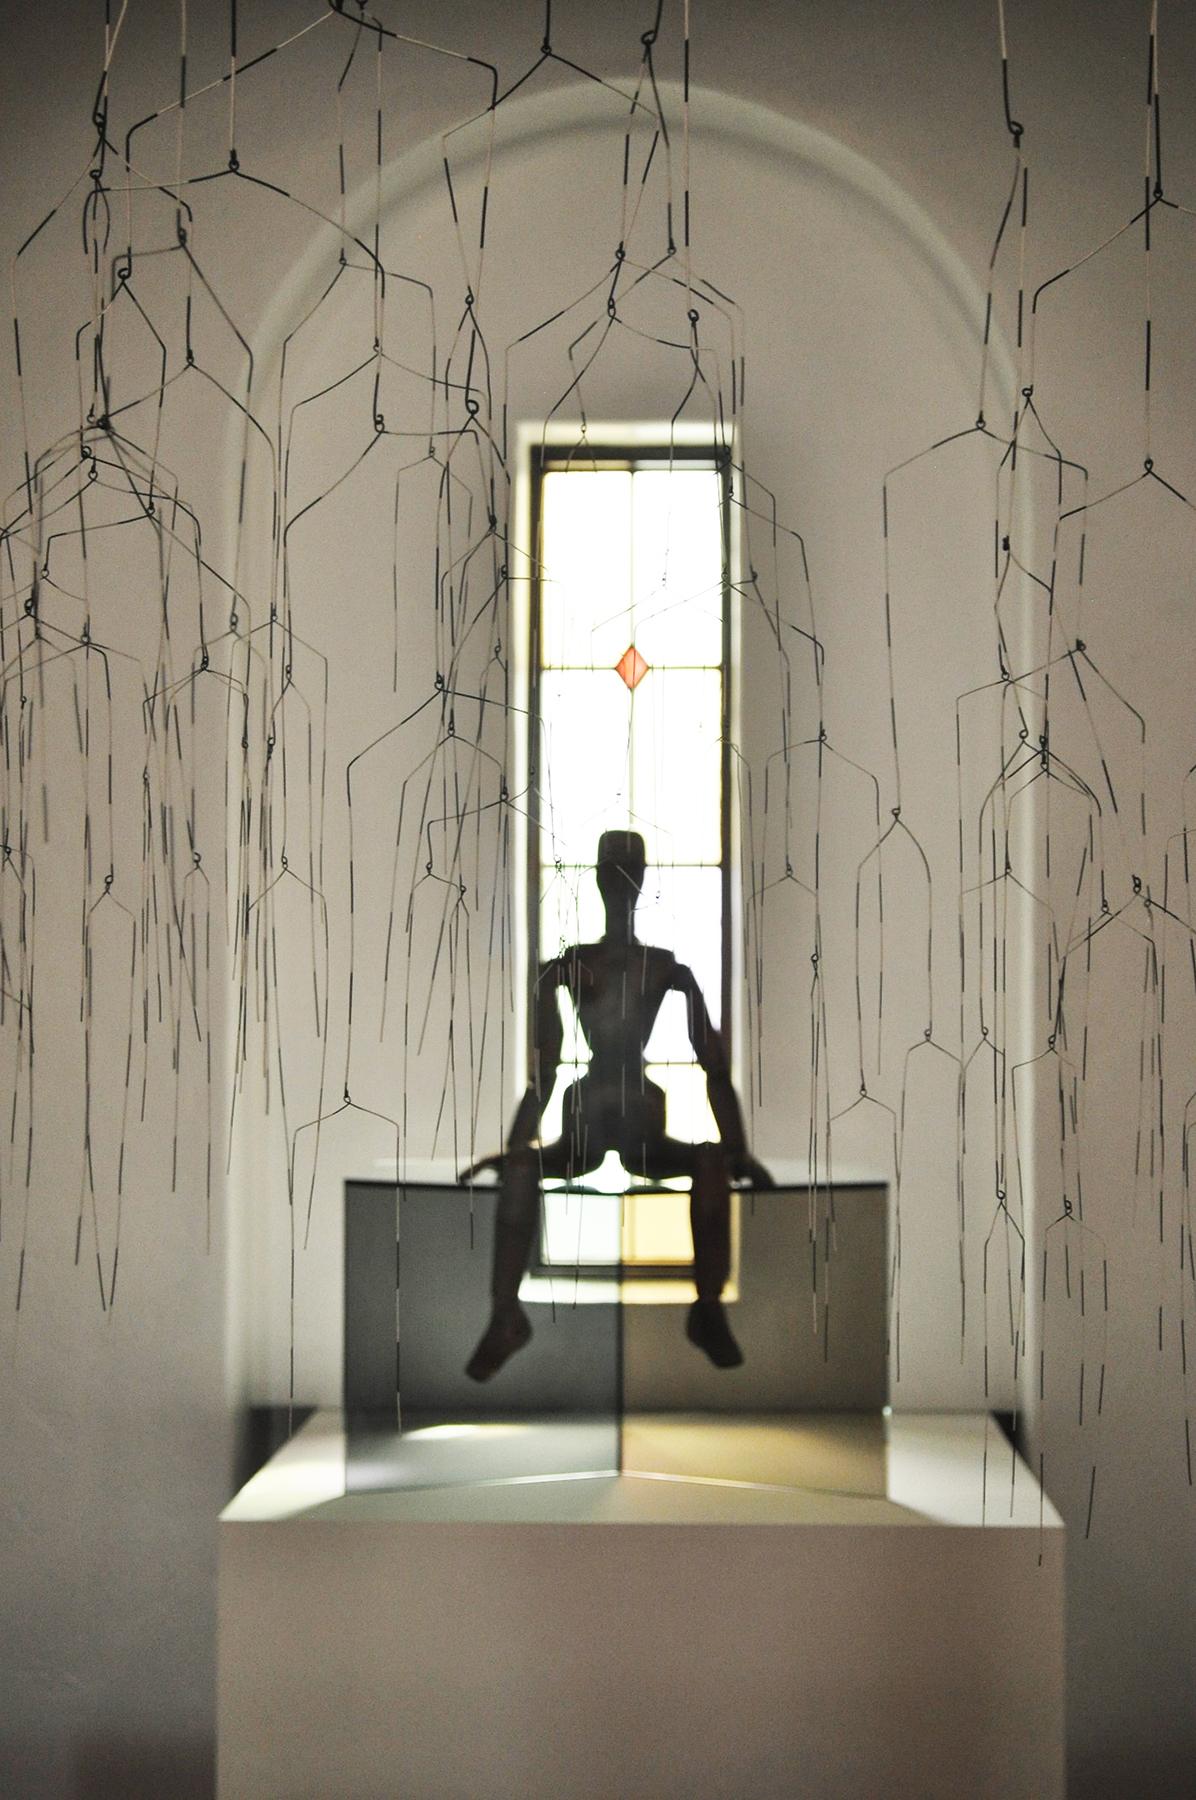 siglo-moderno-sculpting-7.jpg